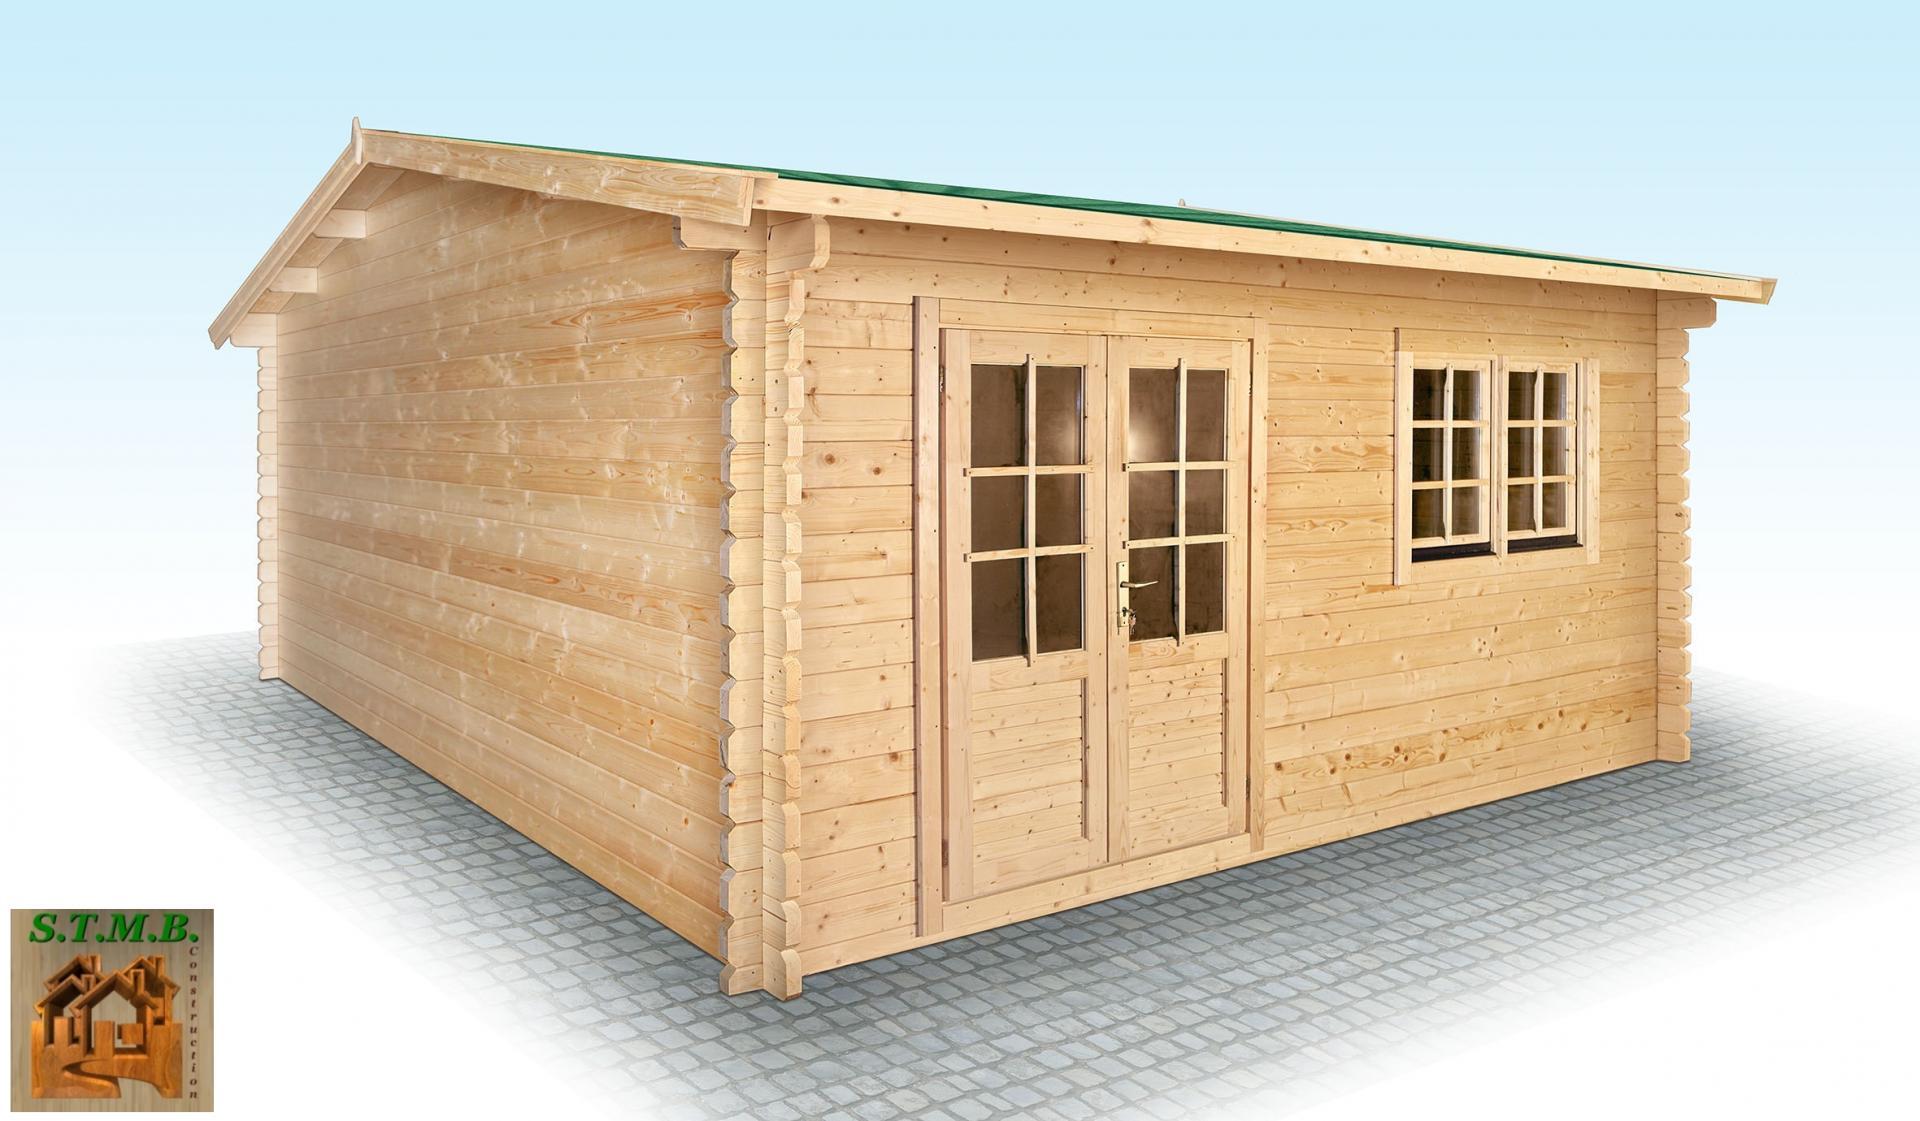 chalet en bois en kit mod le hiba 25 m2 en madriers de 44 mm. Black Bedroom Furniture Sets. Home Design Ideas